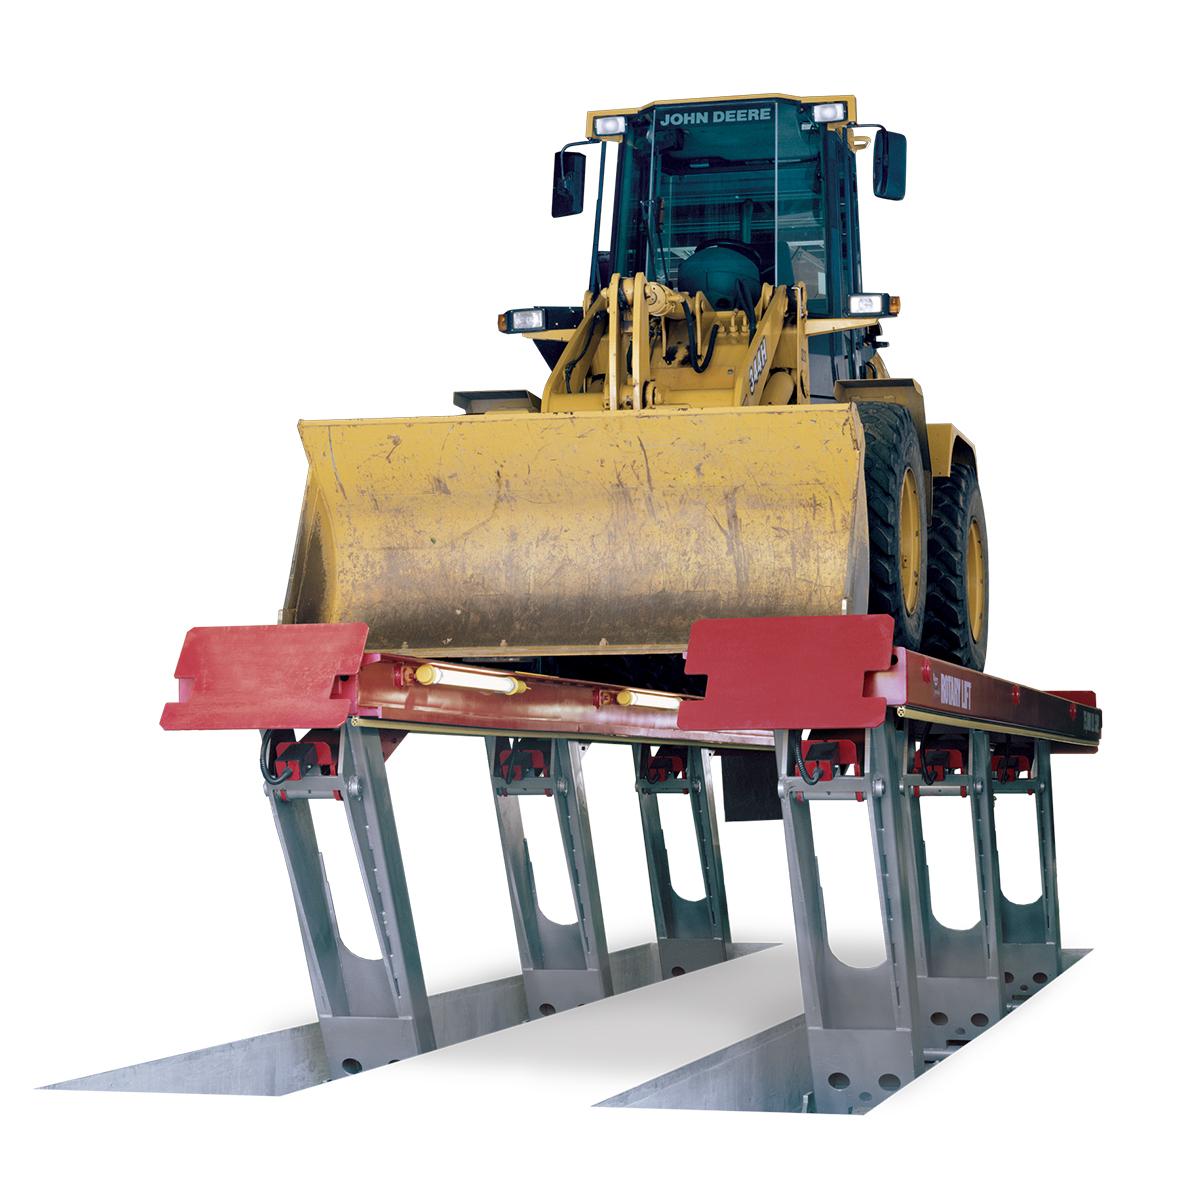 Parallelogram_6legs-bulldozer